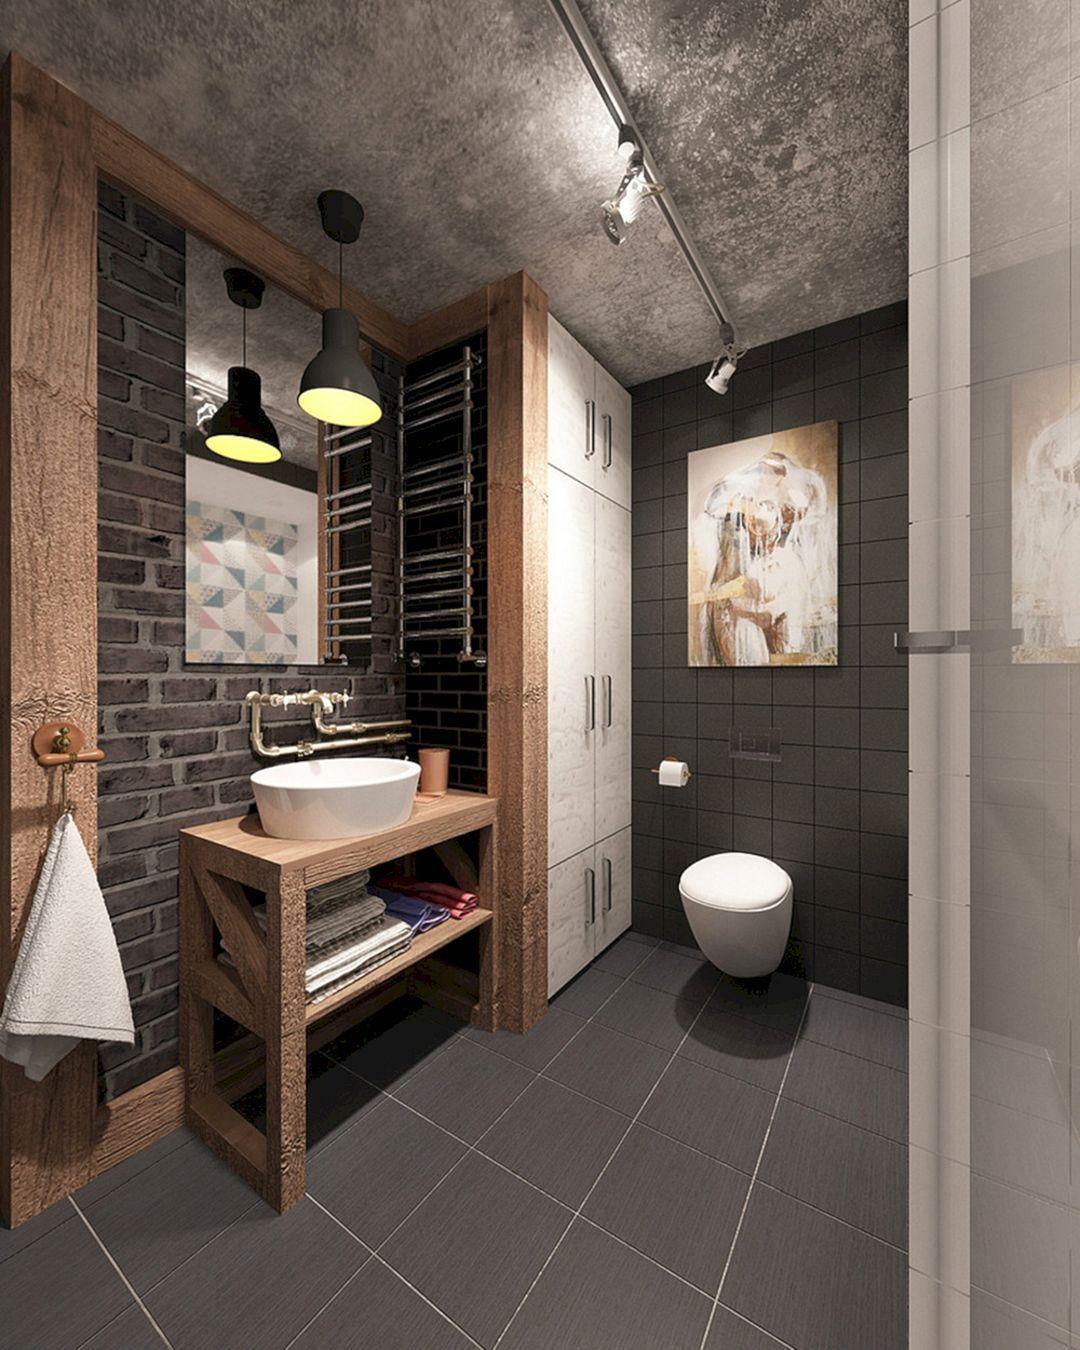 Industrial Small Bathroom Design 9 Industrial Small Bathroom Design 9 Design Ideas And Photos Industrial Bathroom Decor Industrial Bathroom Design Industrial Style Bathroom